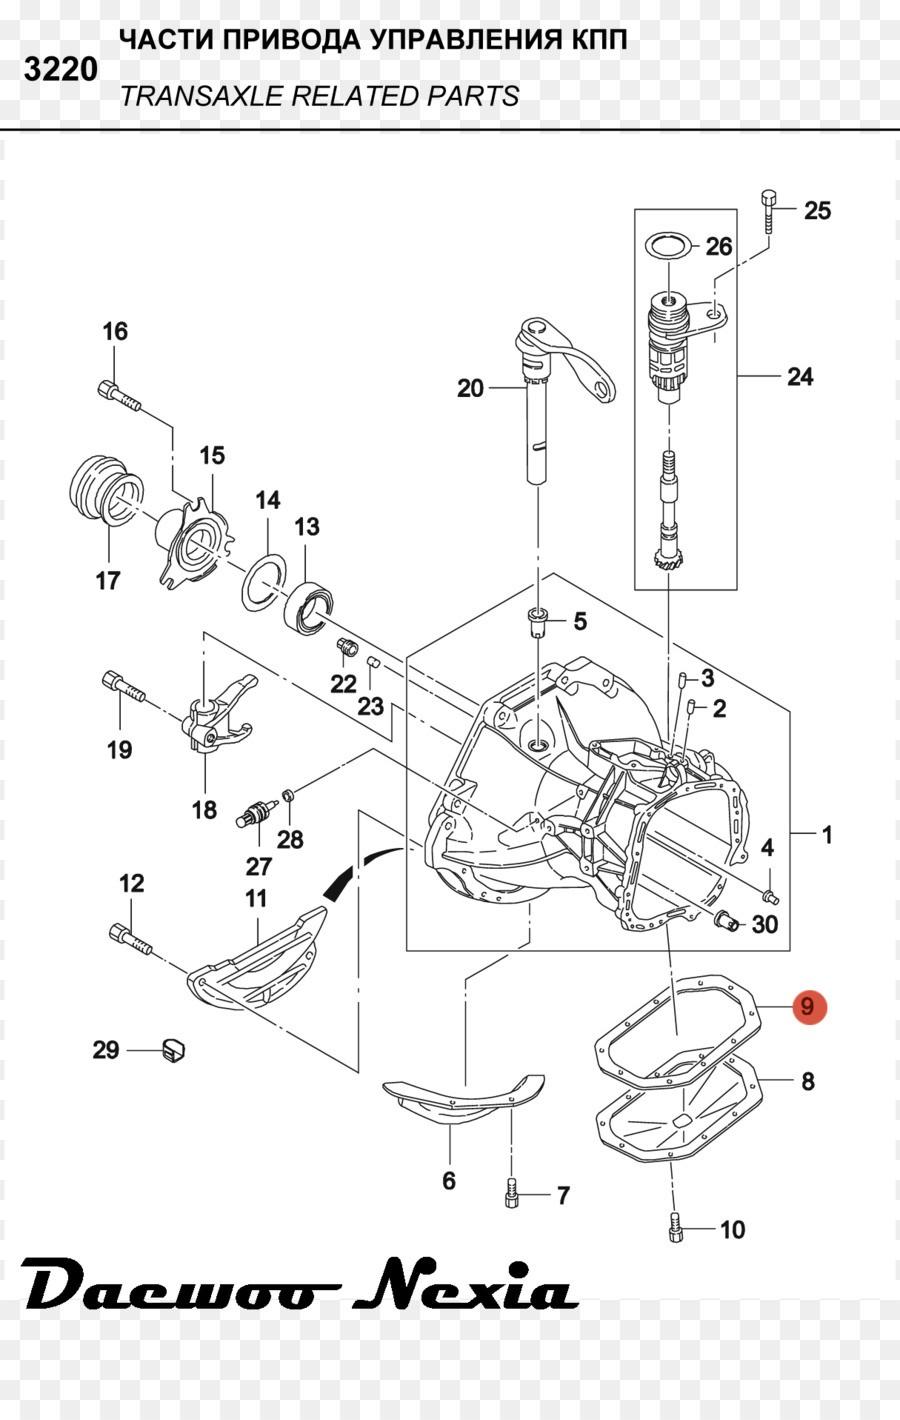 Daewoo Matiz Engine Schematic 2002 Daewoo Nubira Engine Diagram Cars Wiring Diagram Of Daewoo Matiz Engine Schematic